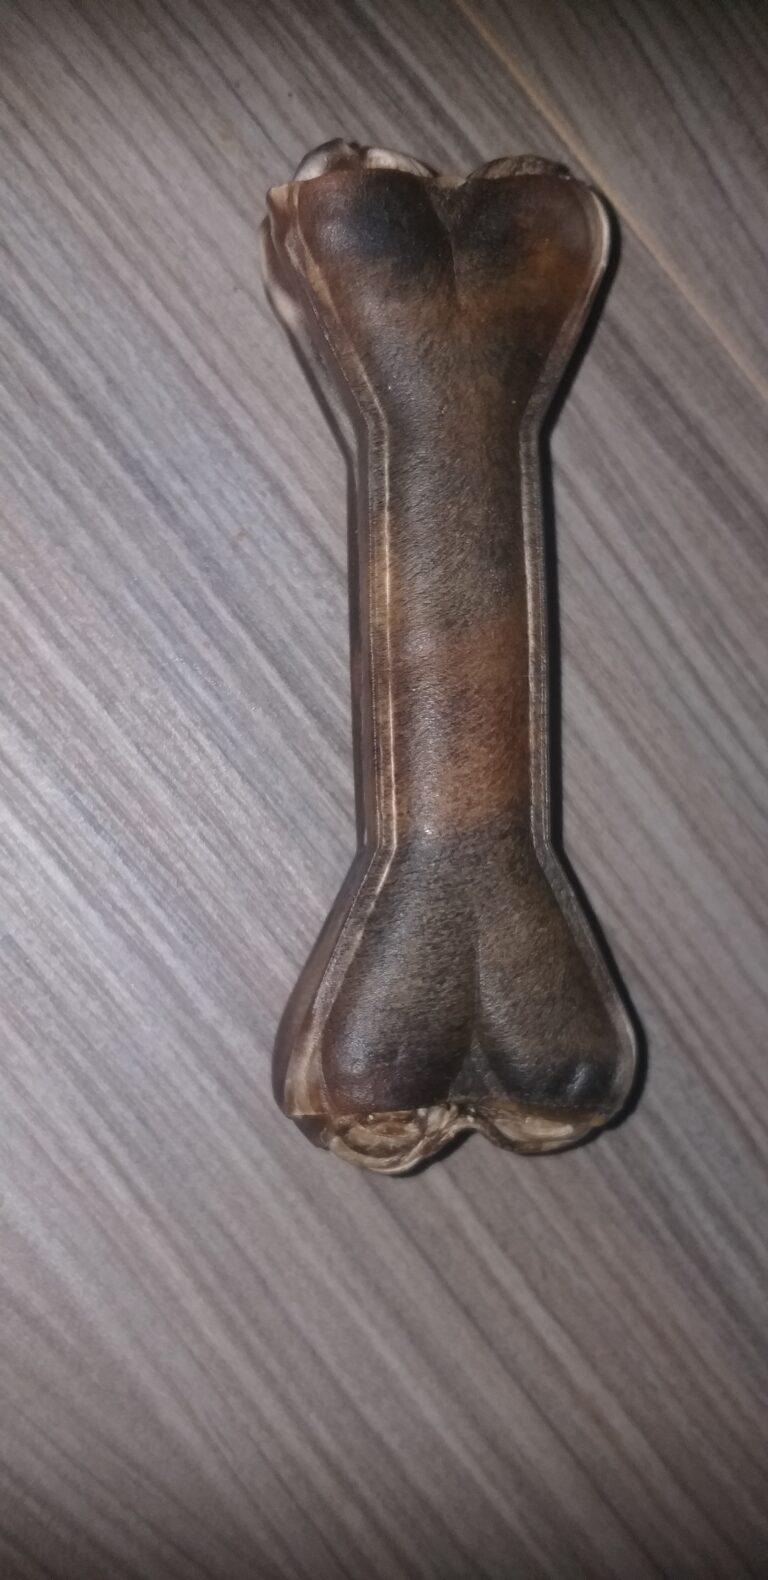 Pferdehautknochen